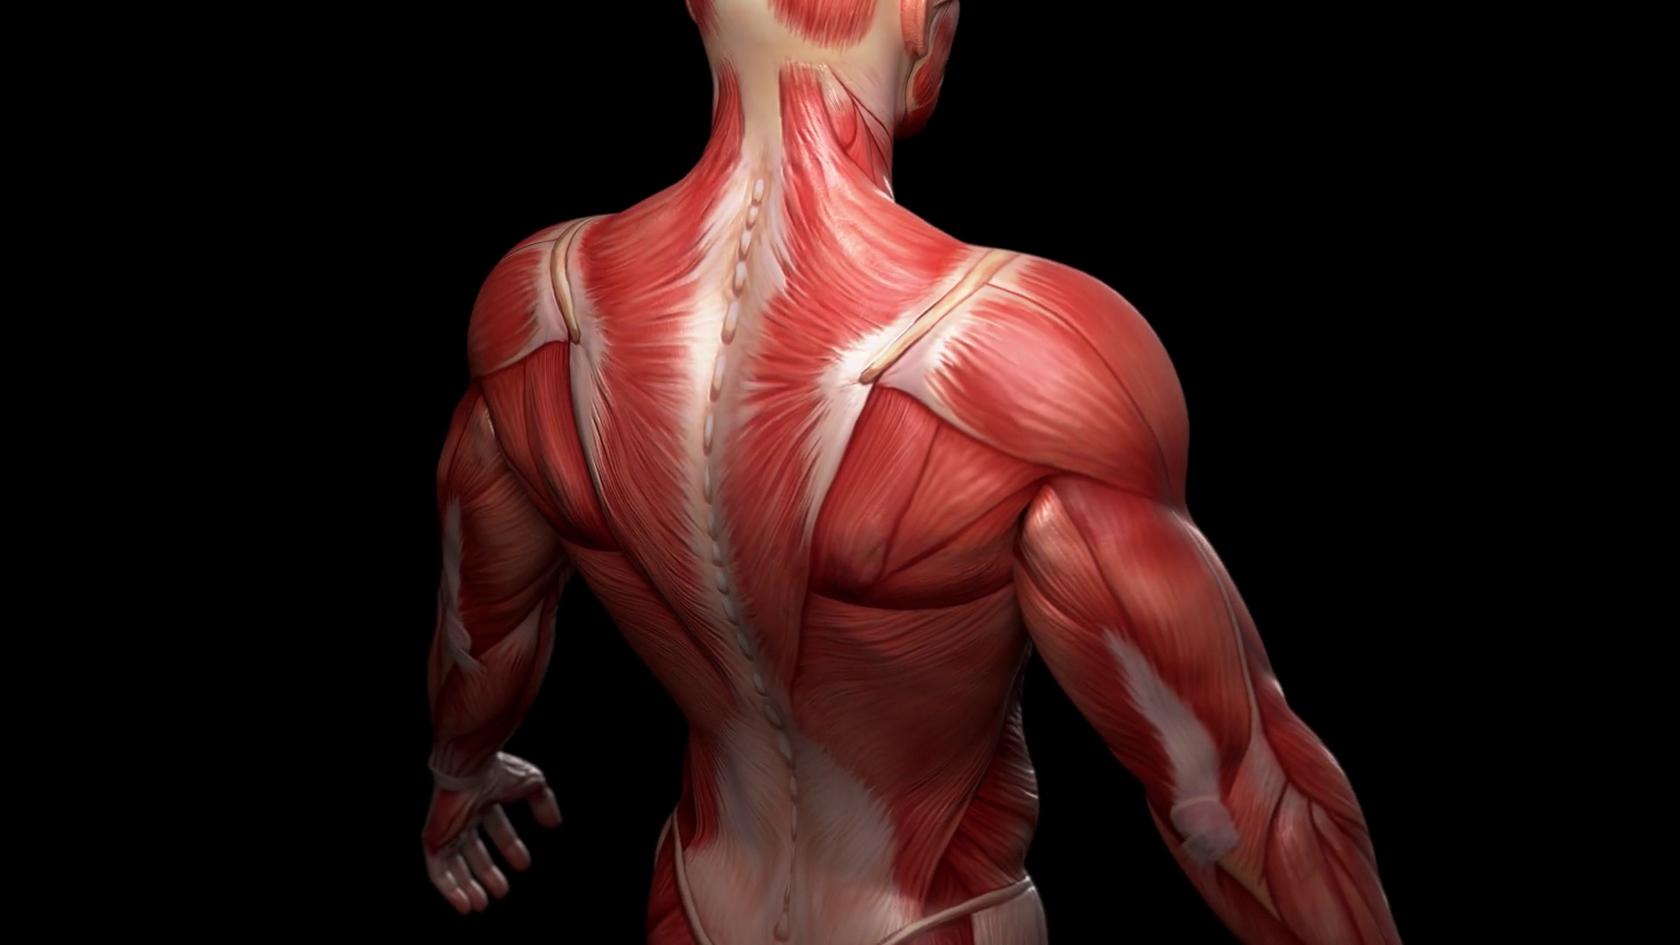 Мышцы спины анатомия реферат 9587